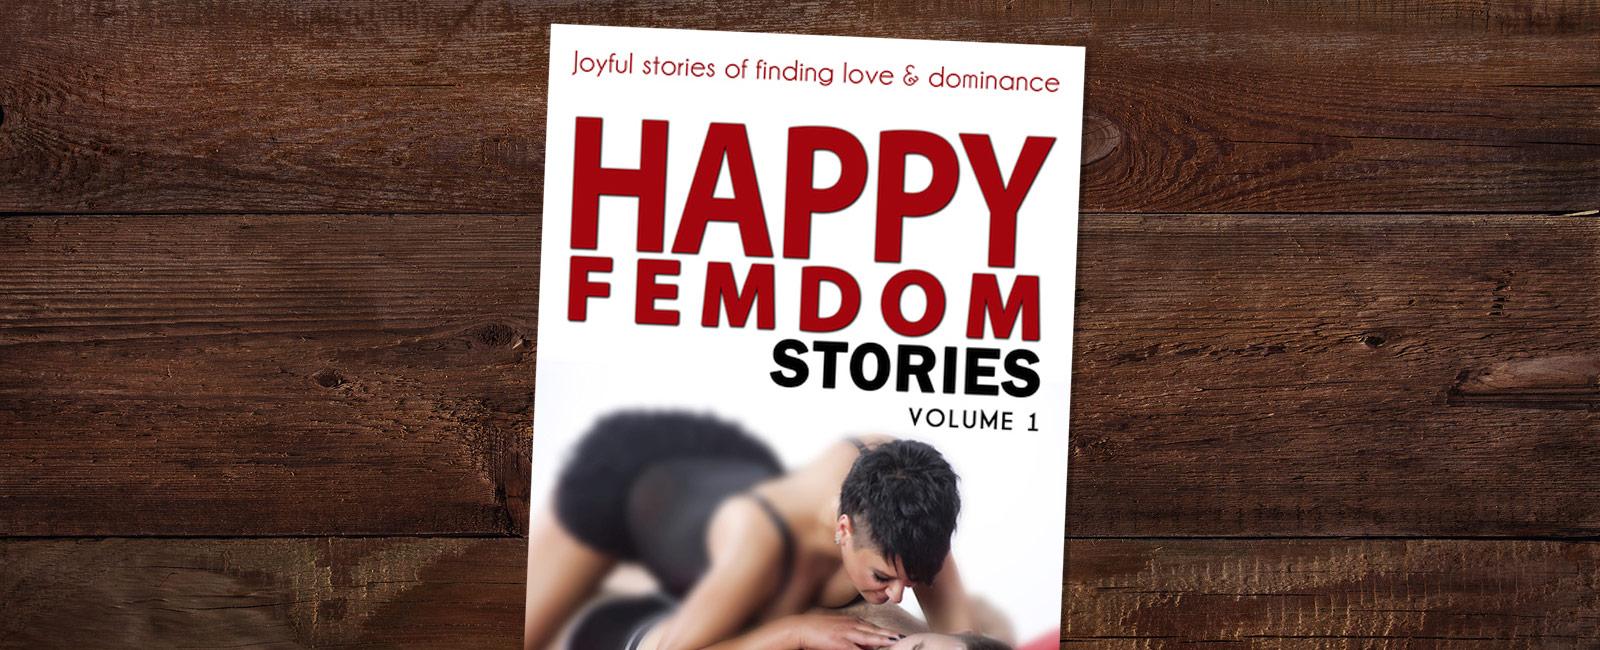 25 Happy Femdom Stories